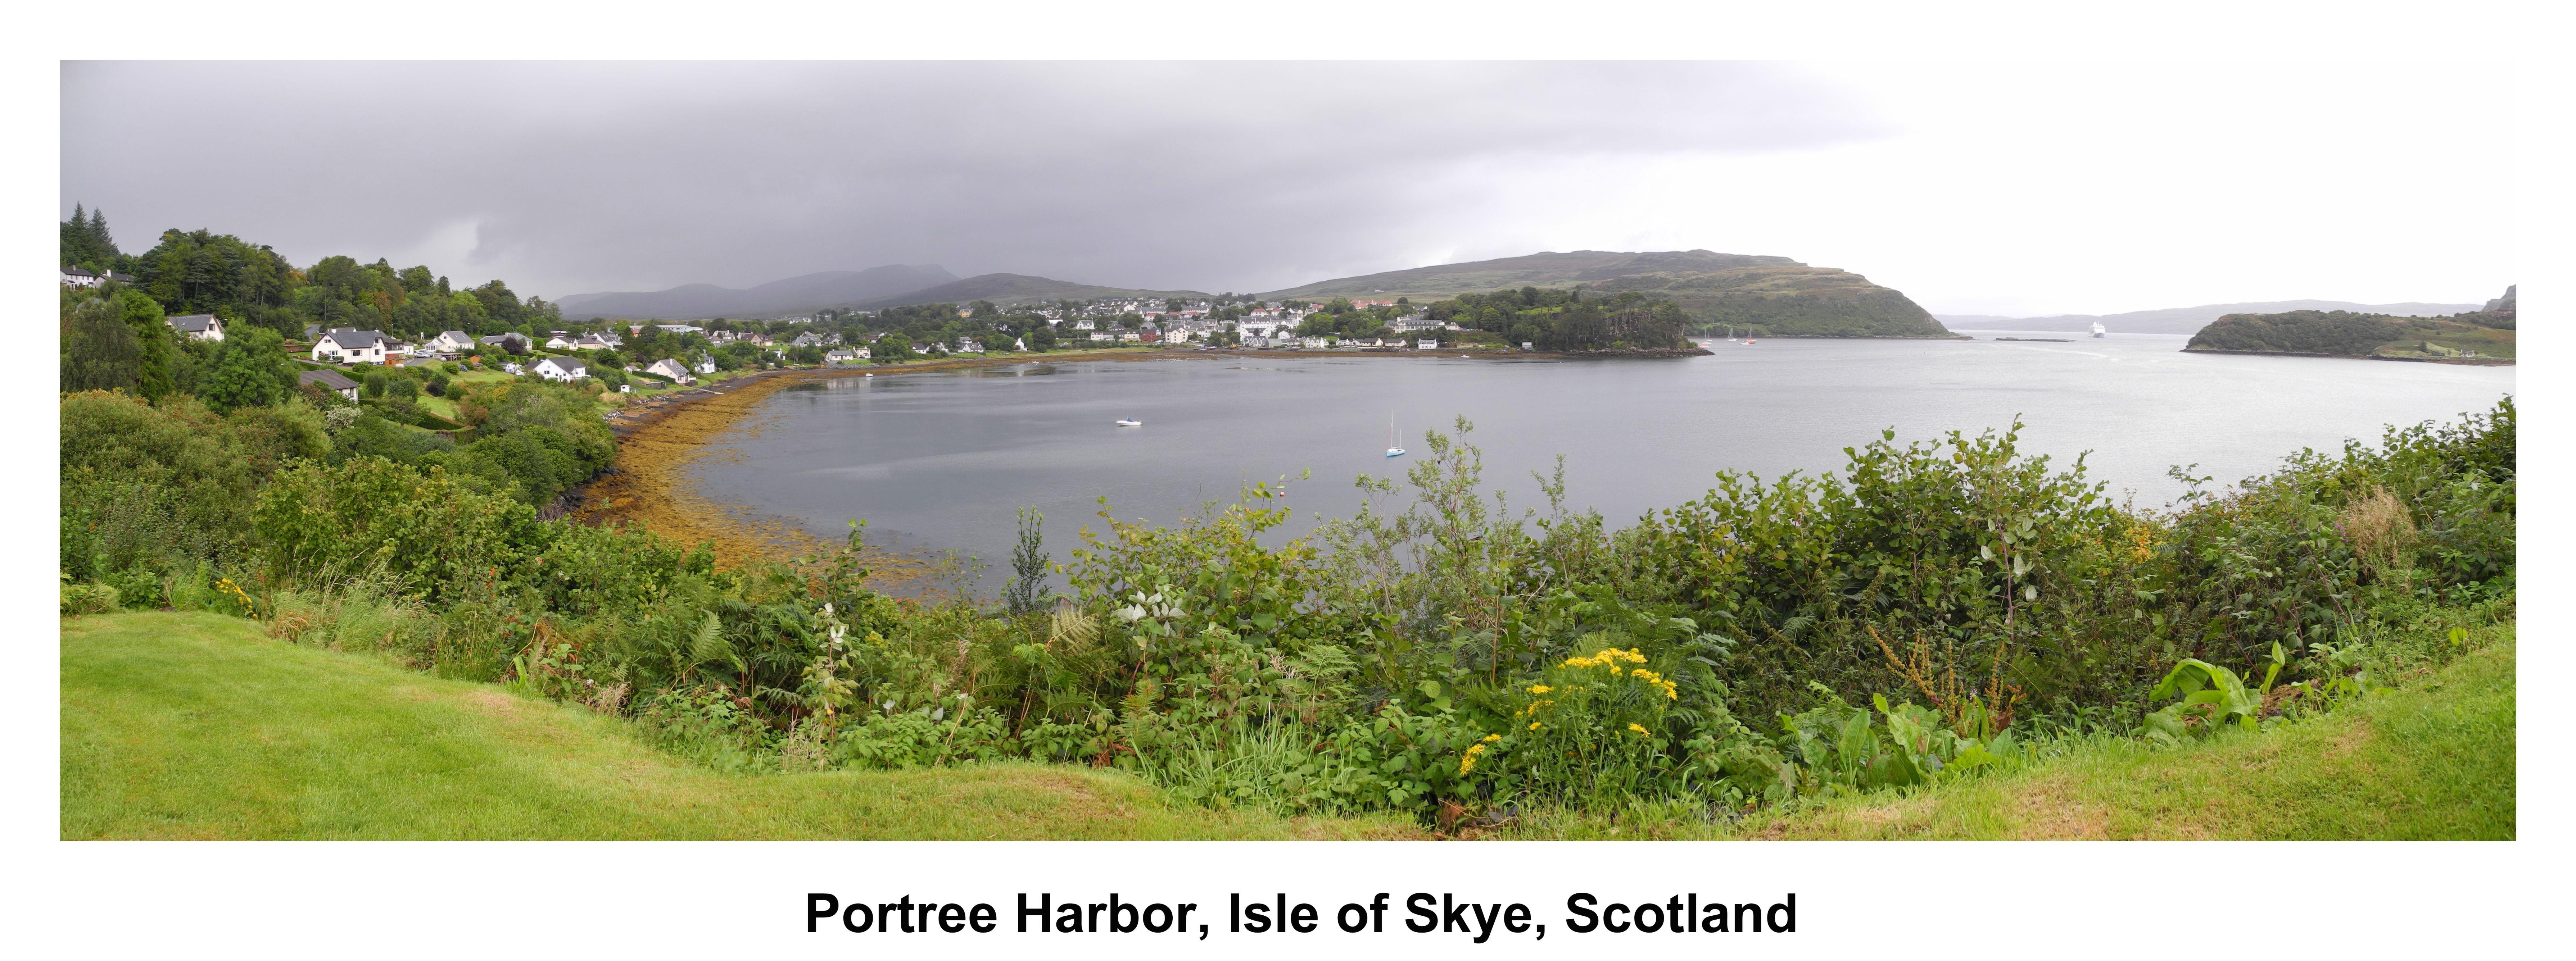 Portree Harbor, Isle of Skye, Scotland #2